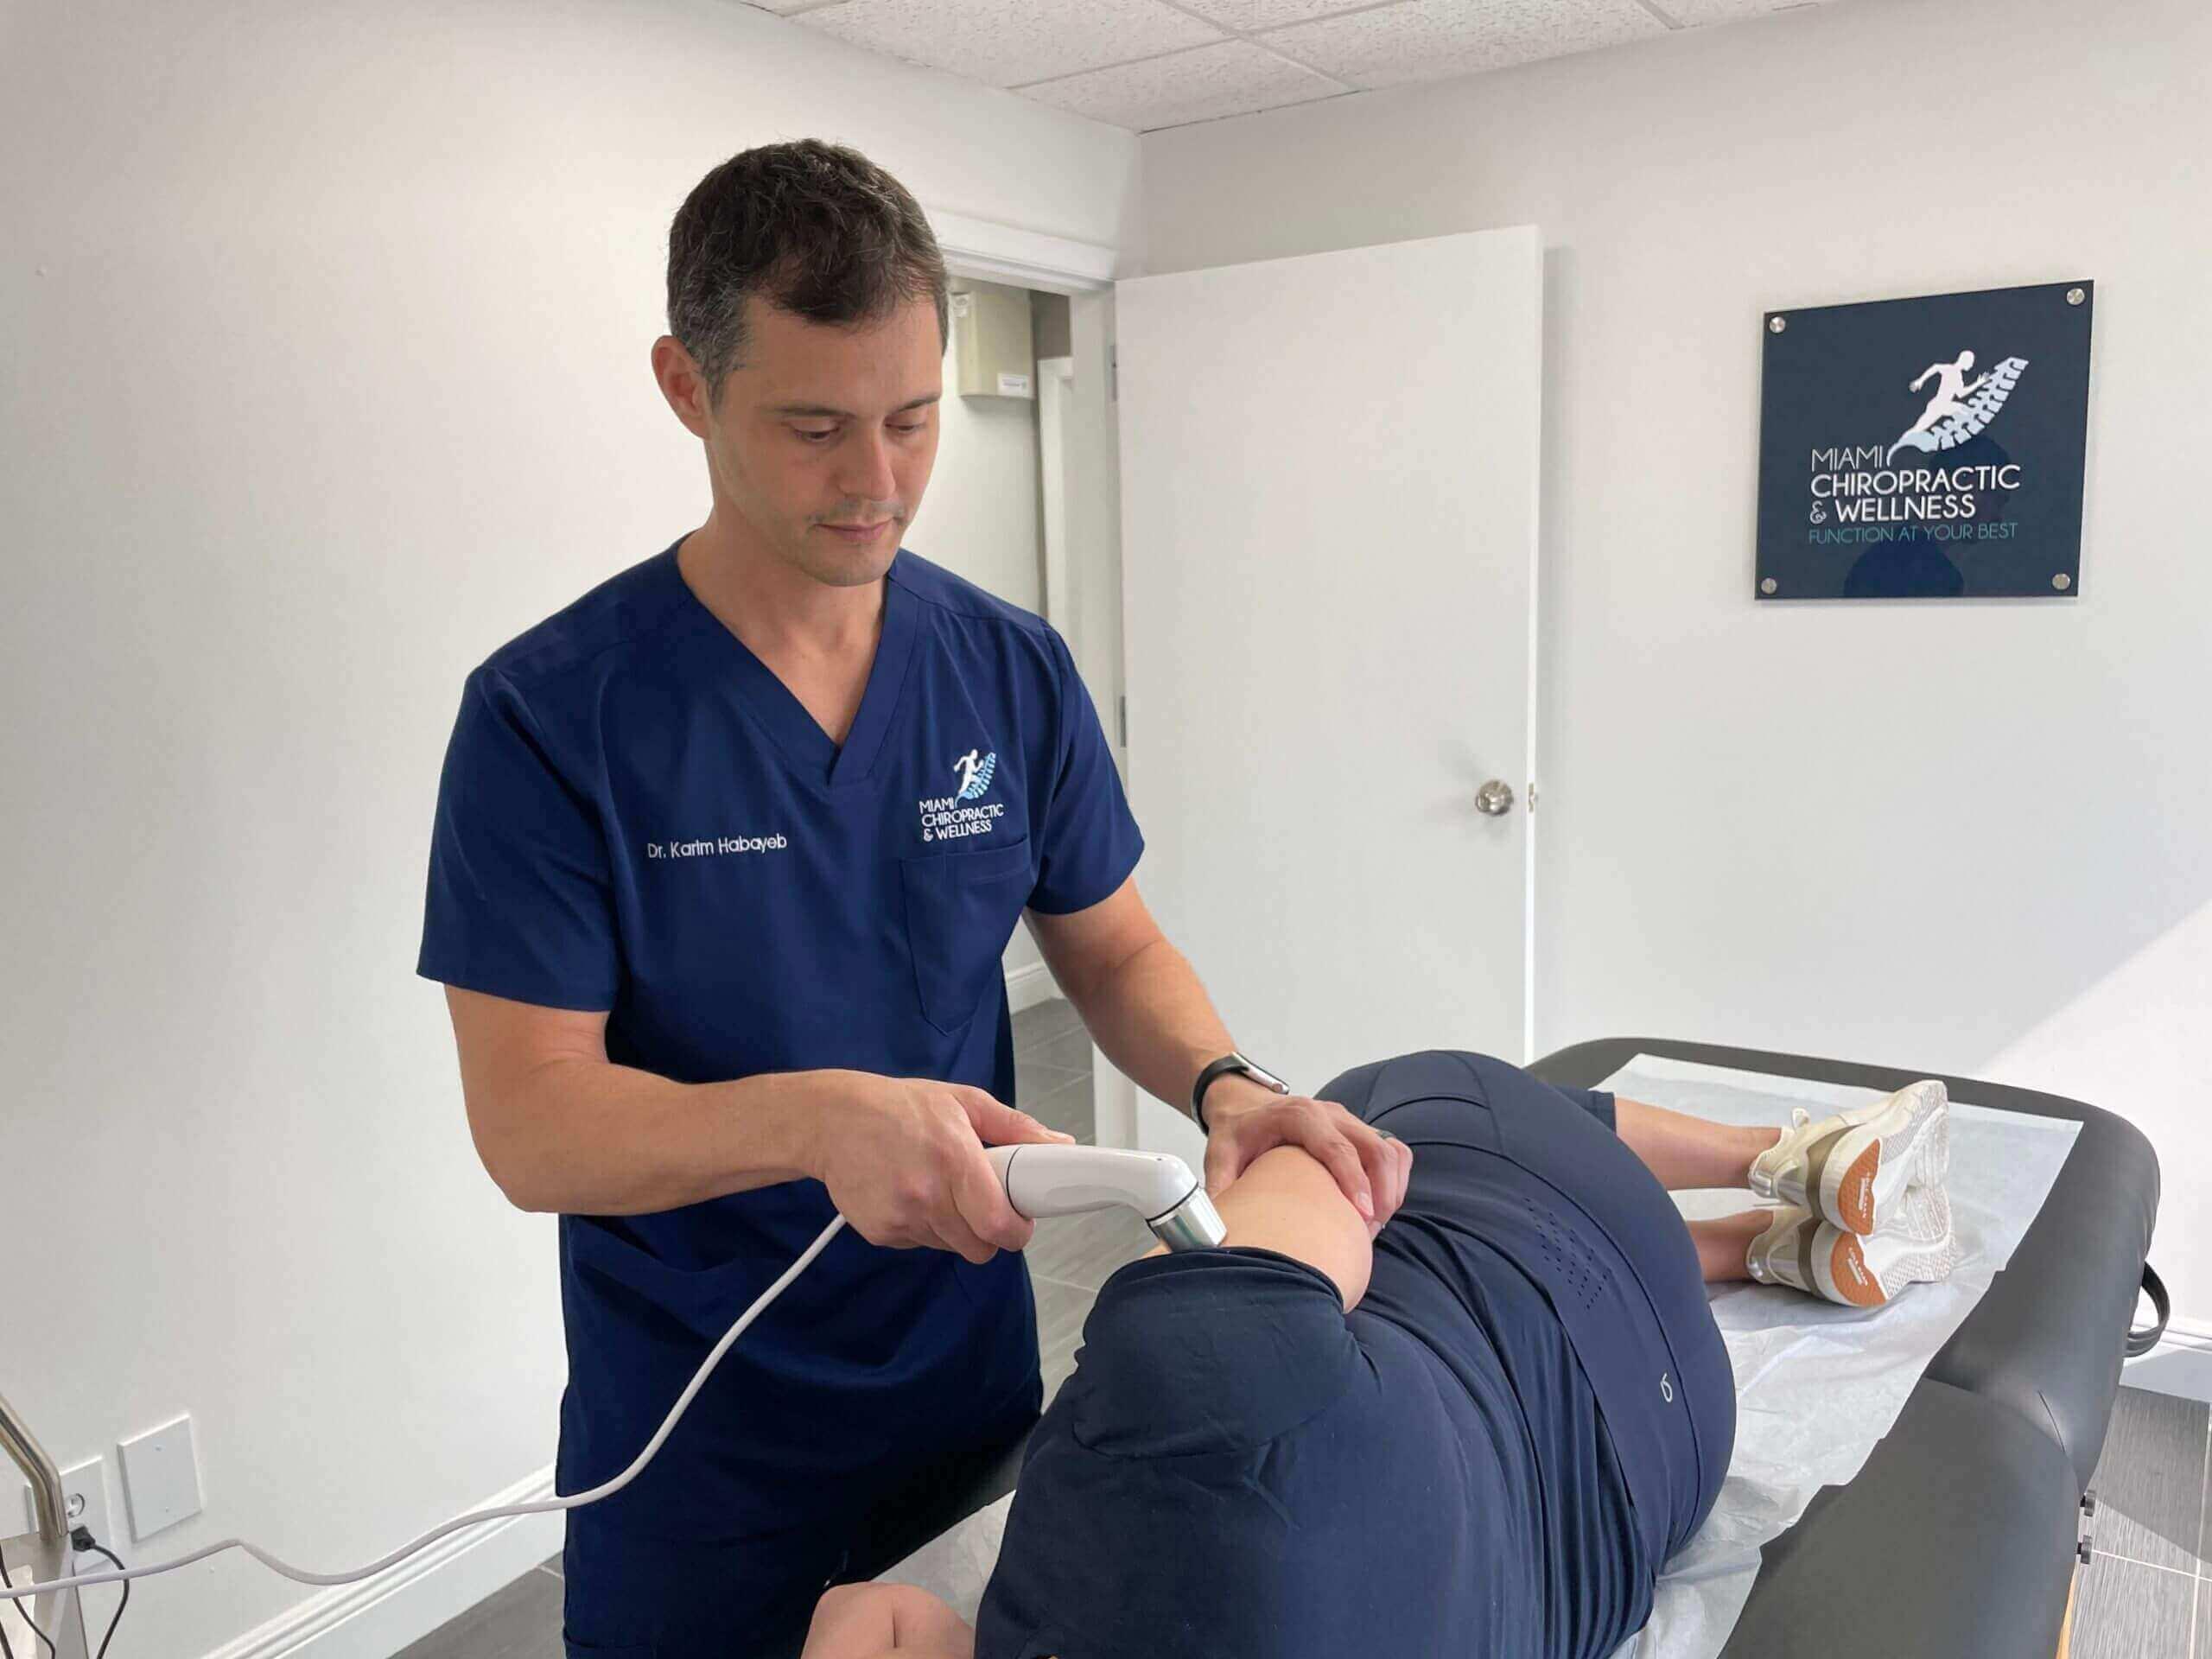 Miami Chiropractic Wellness - Ultrasound